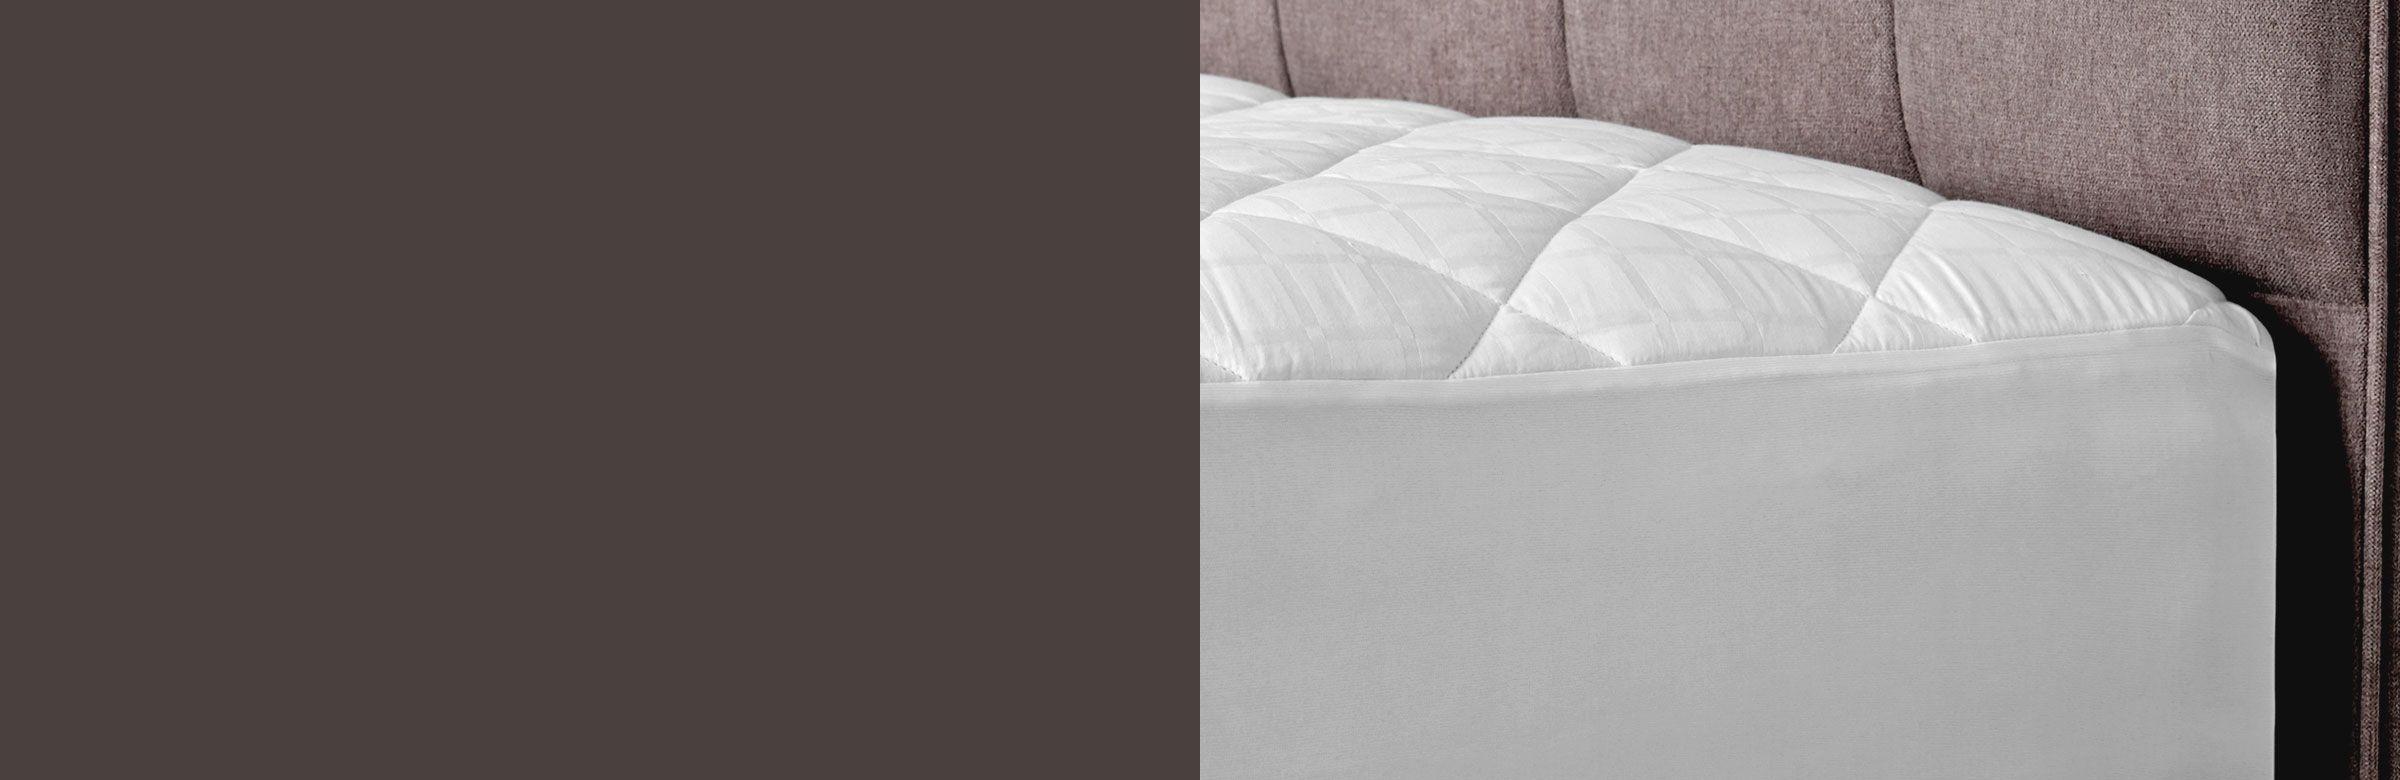 matras ikea 160x200 trendy best bett with topper x ikea with matras ikea 160x200 traagschuim. Black Bedroom Furniture Sets. Home Design Ideas